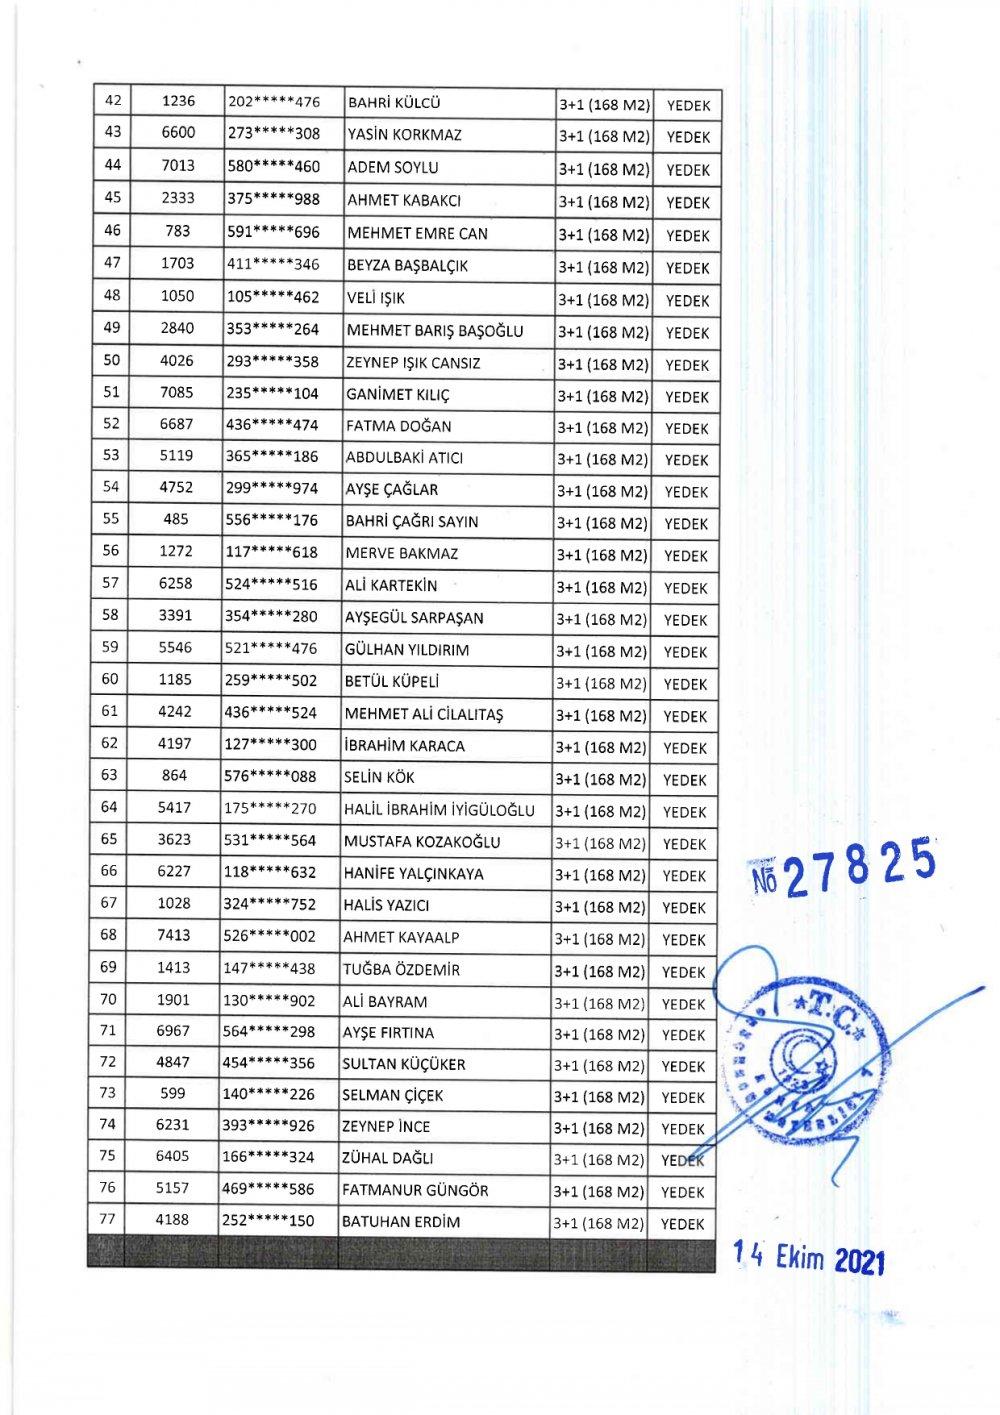 ss-turgutreis-evleri-kyk-kura-cekilis-listesi-page-0017.jpg